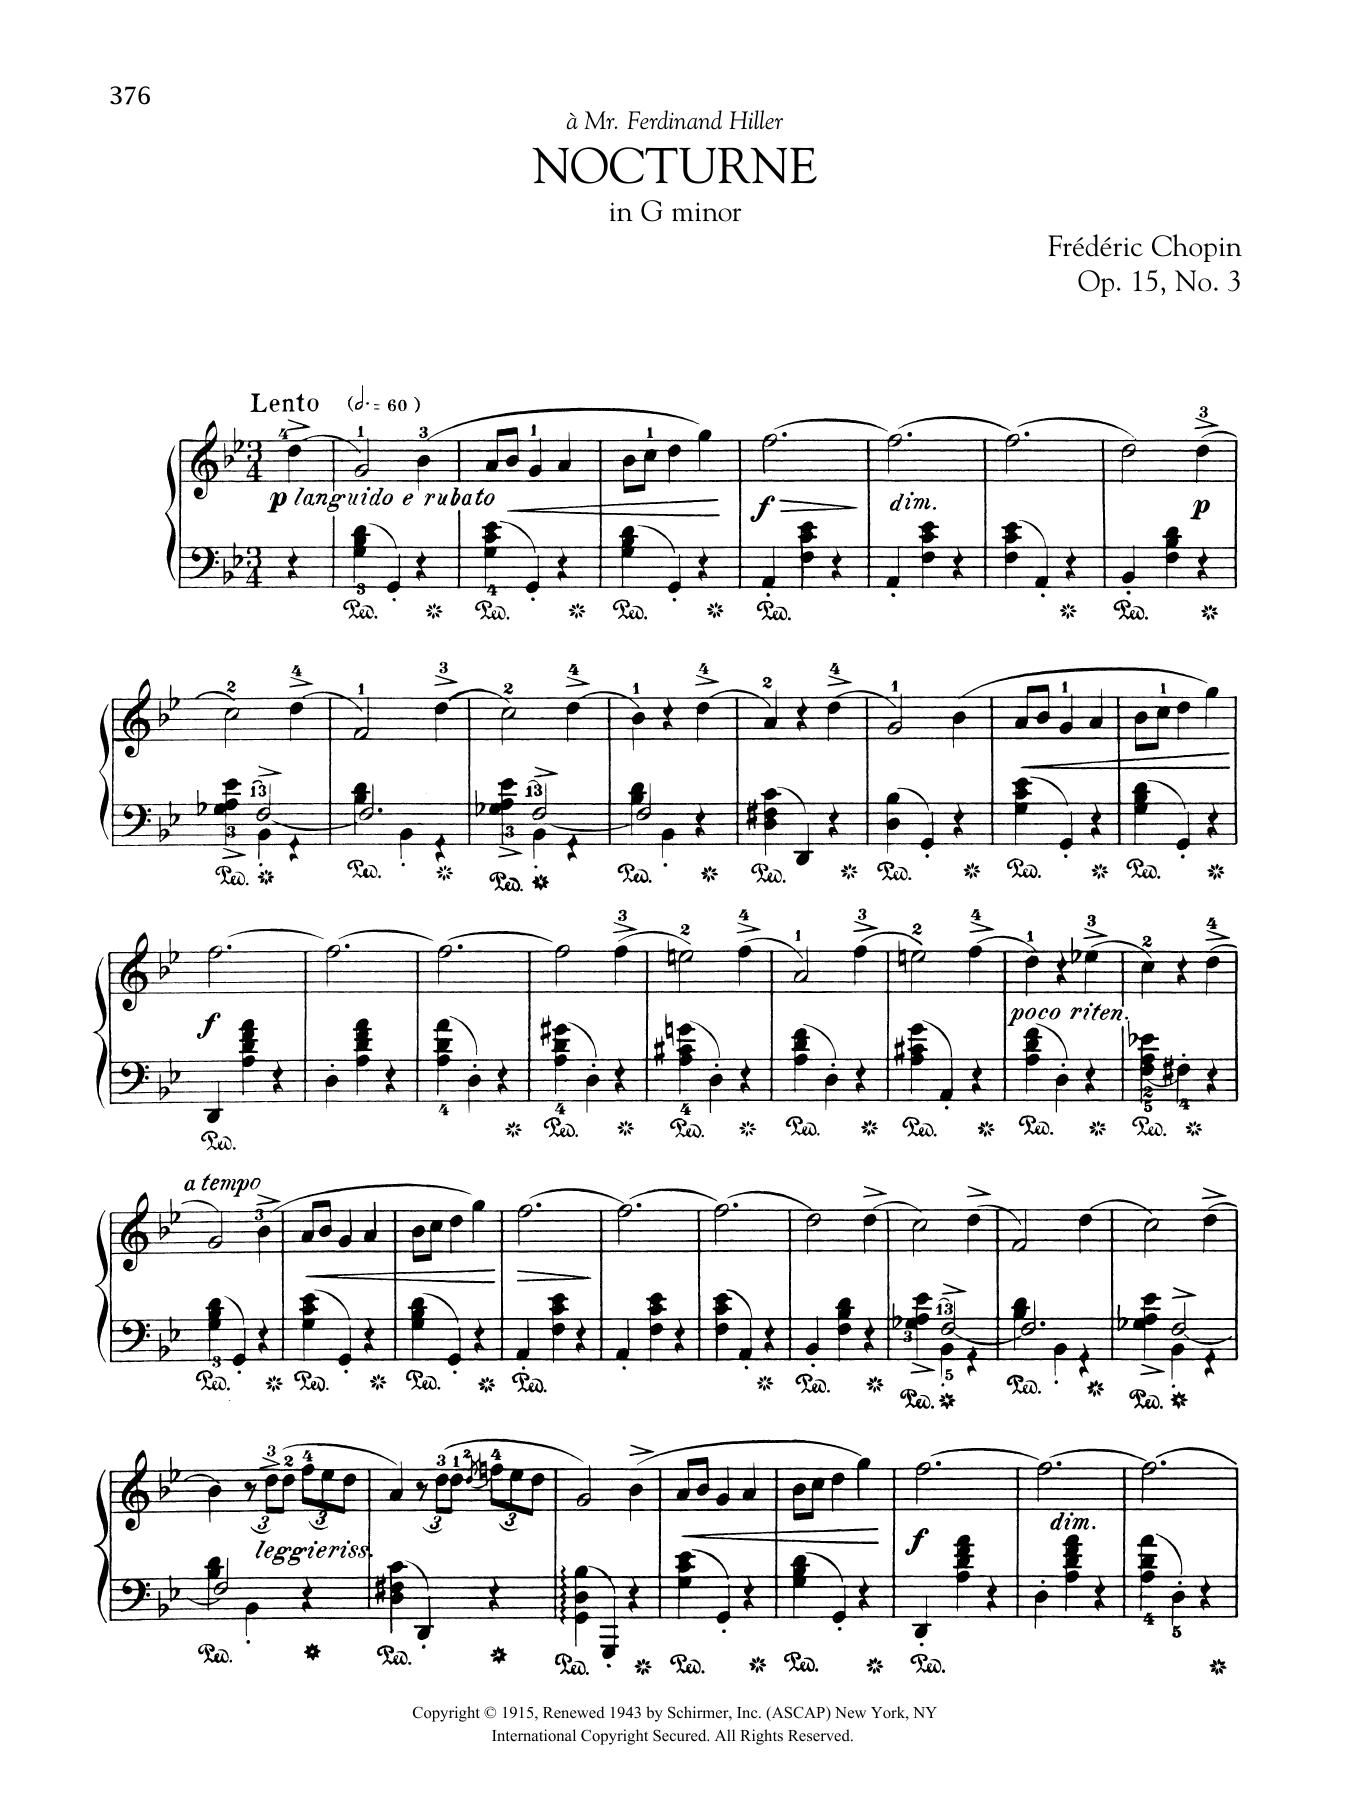 Nocturne in G minor, Op. 15, No. 3 Sheet Music